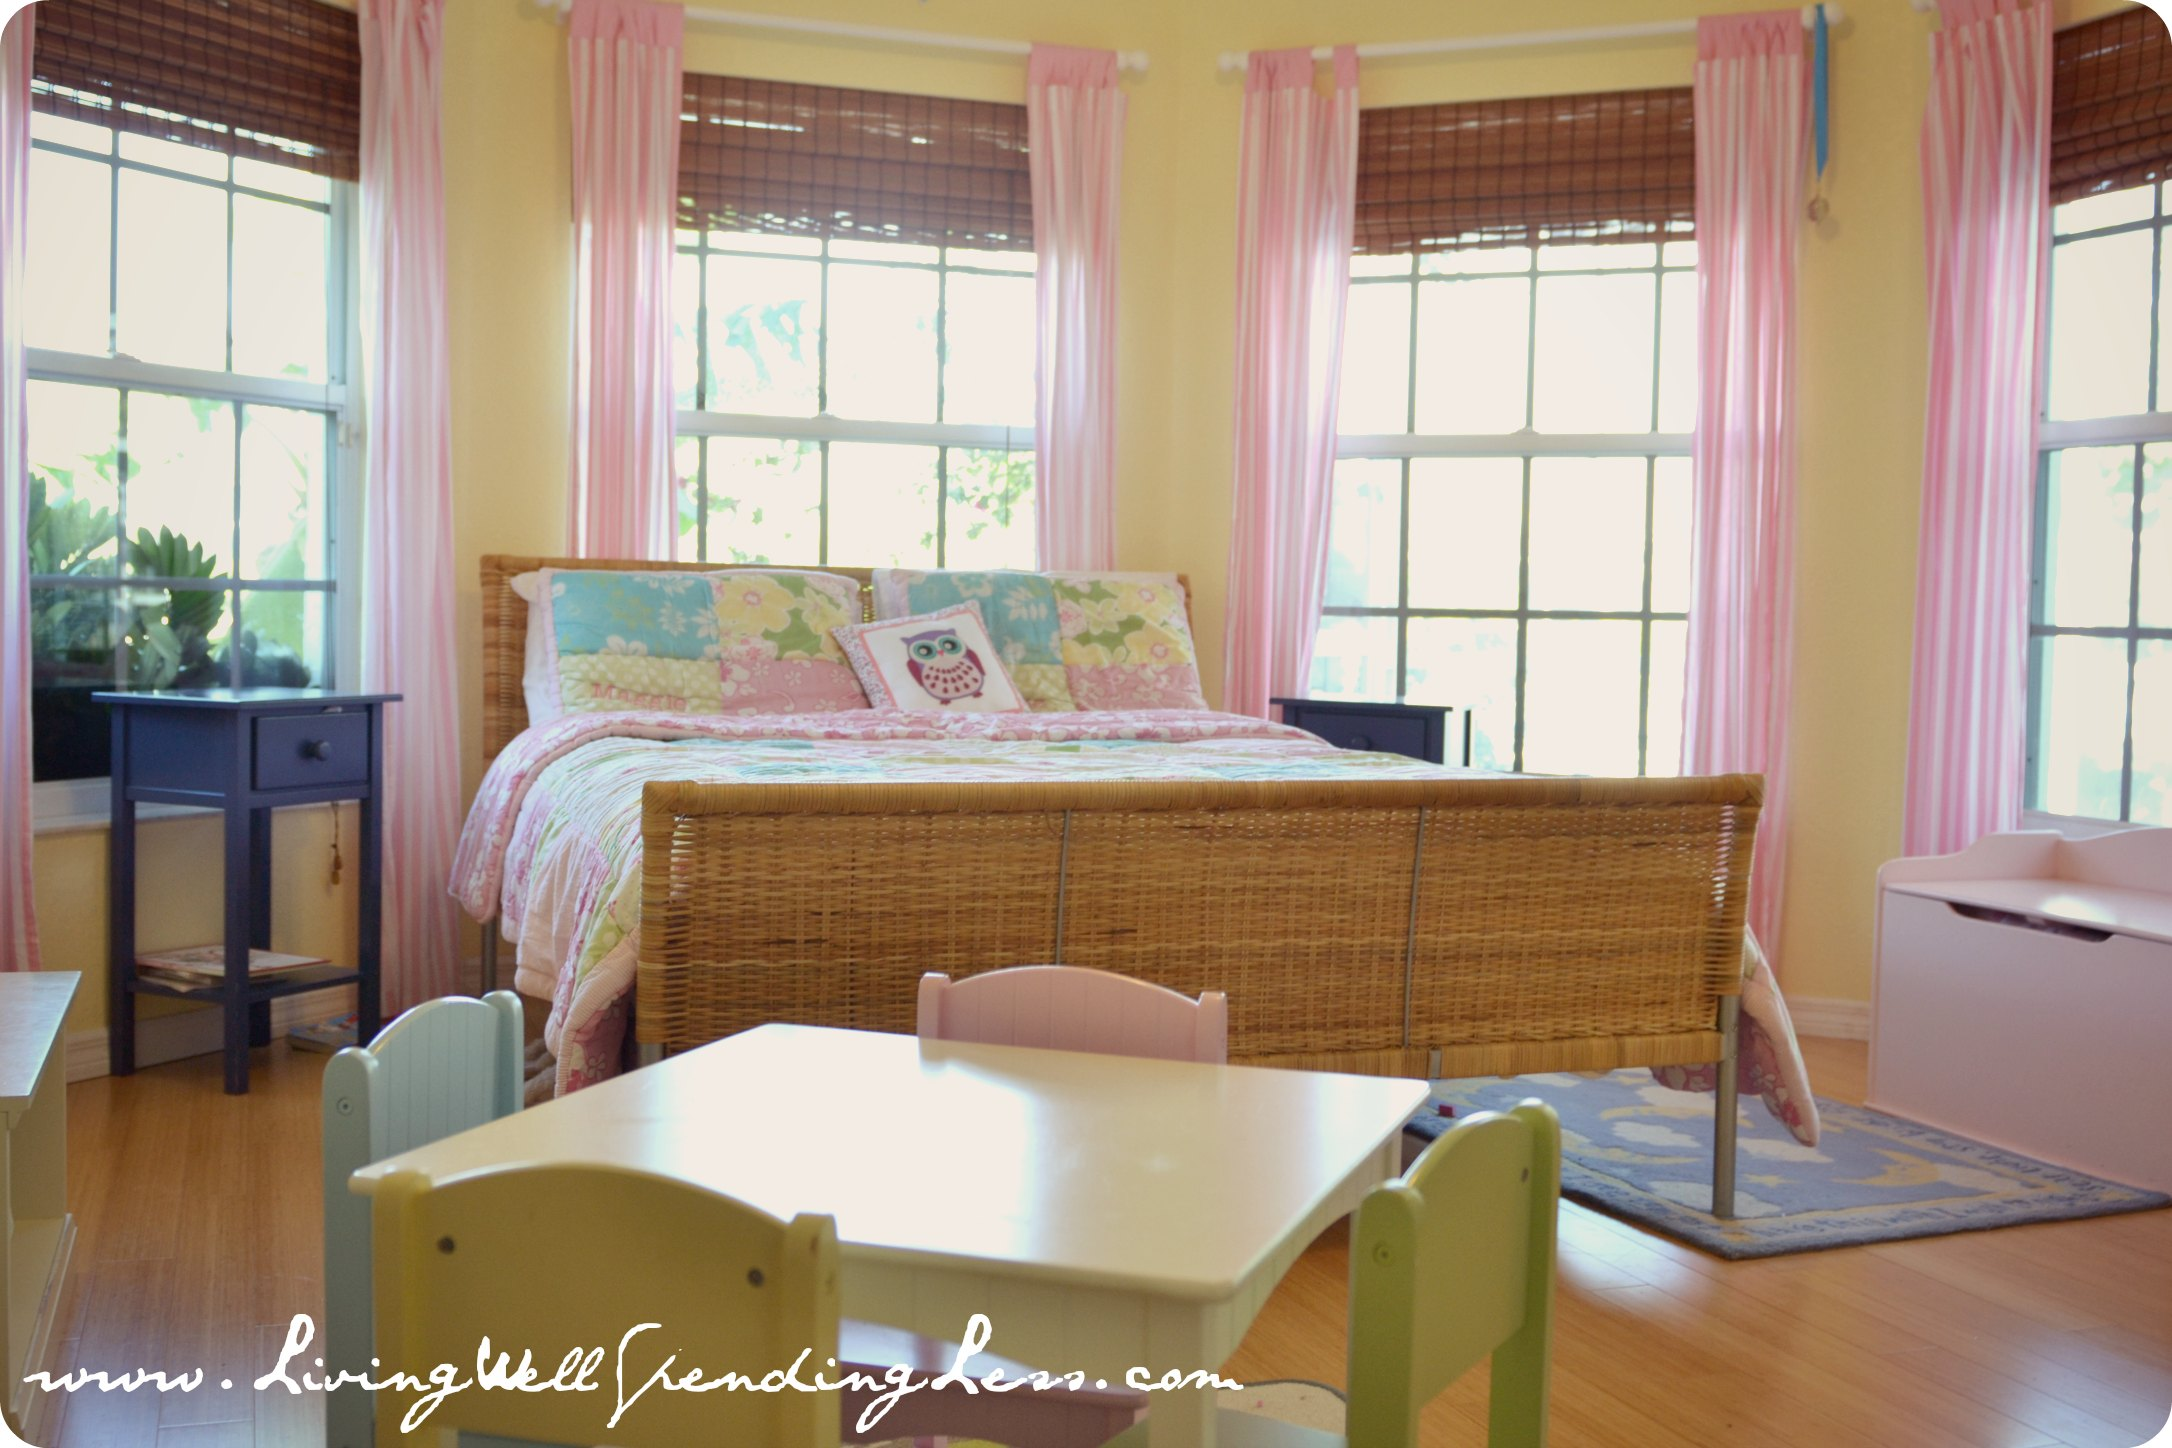 Clean Room from How I get my kids to clean their room via livingwellspendinglesscom kids